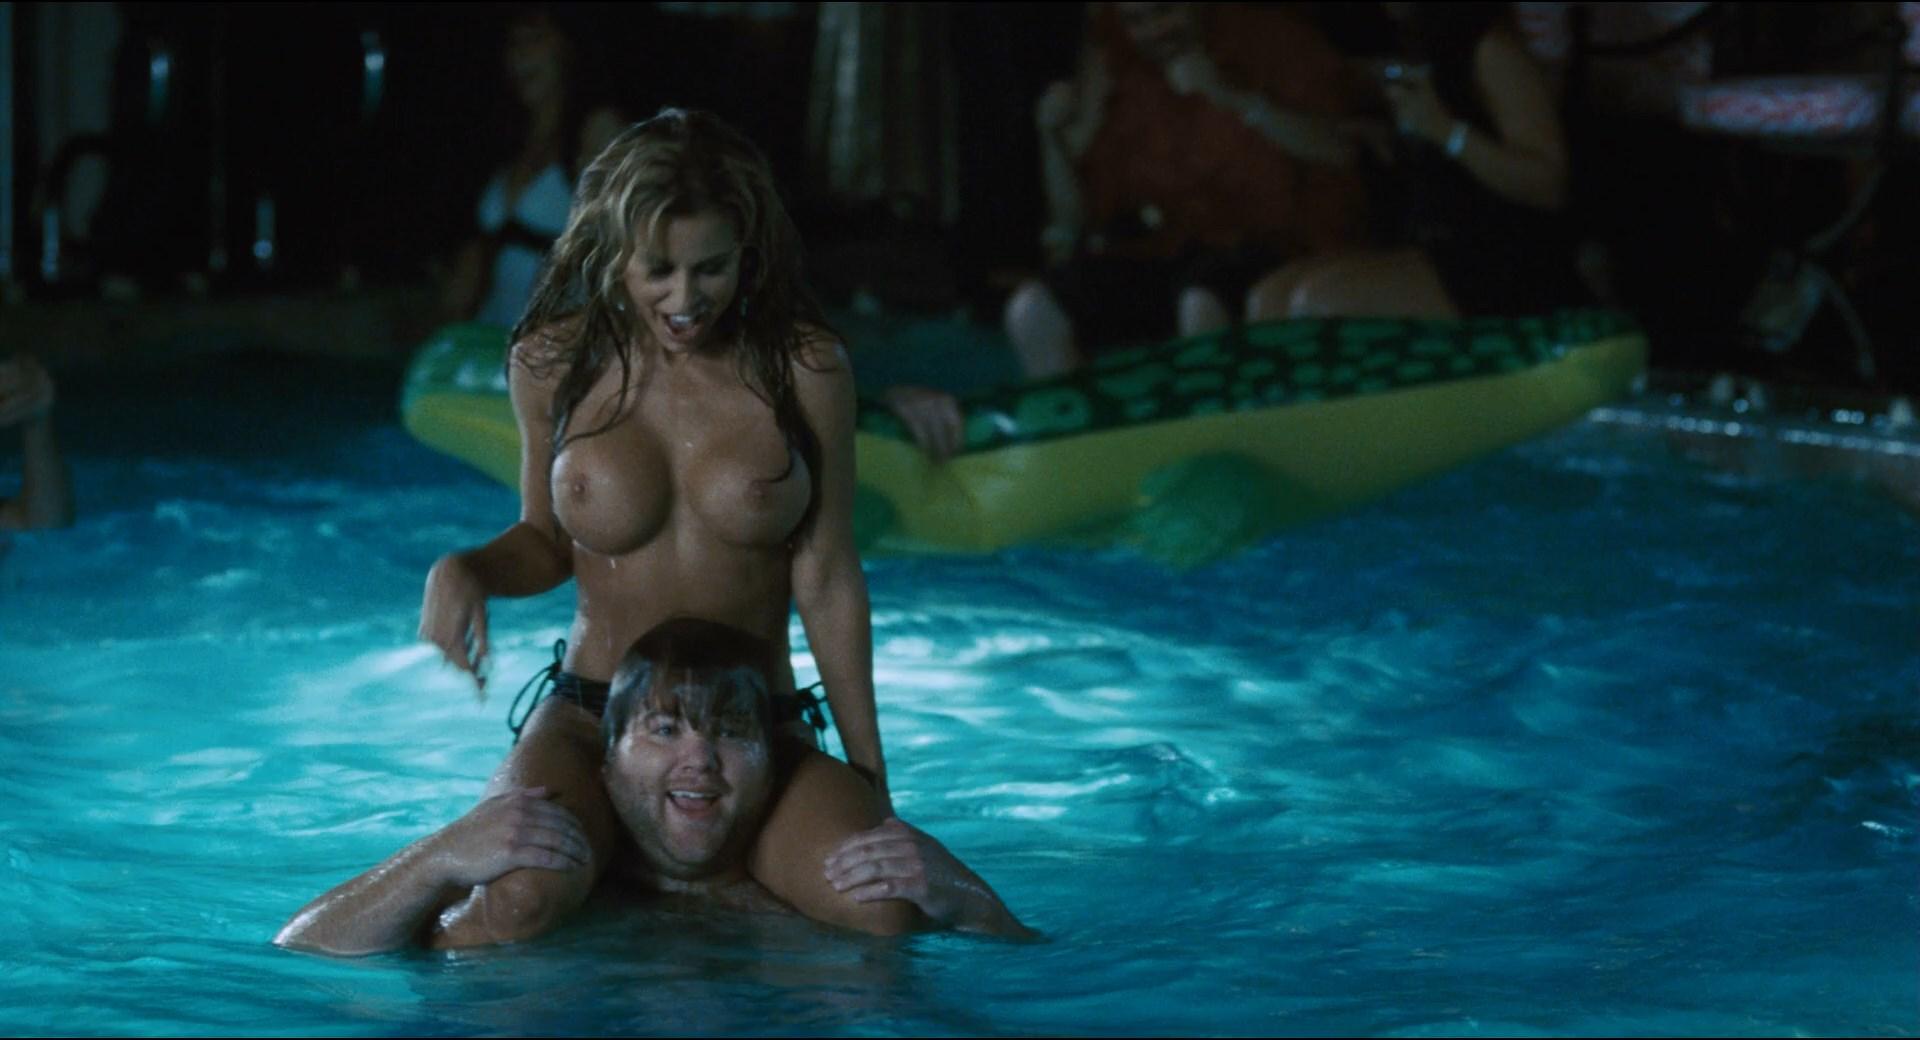 Ashley benson, vanessa hudgens james franco threesome pool scene